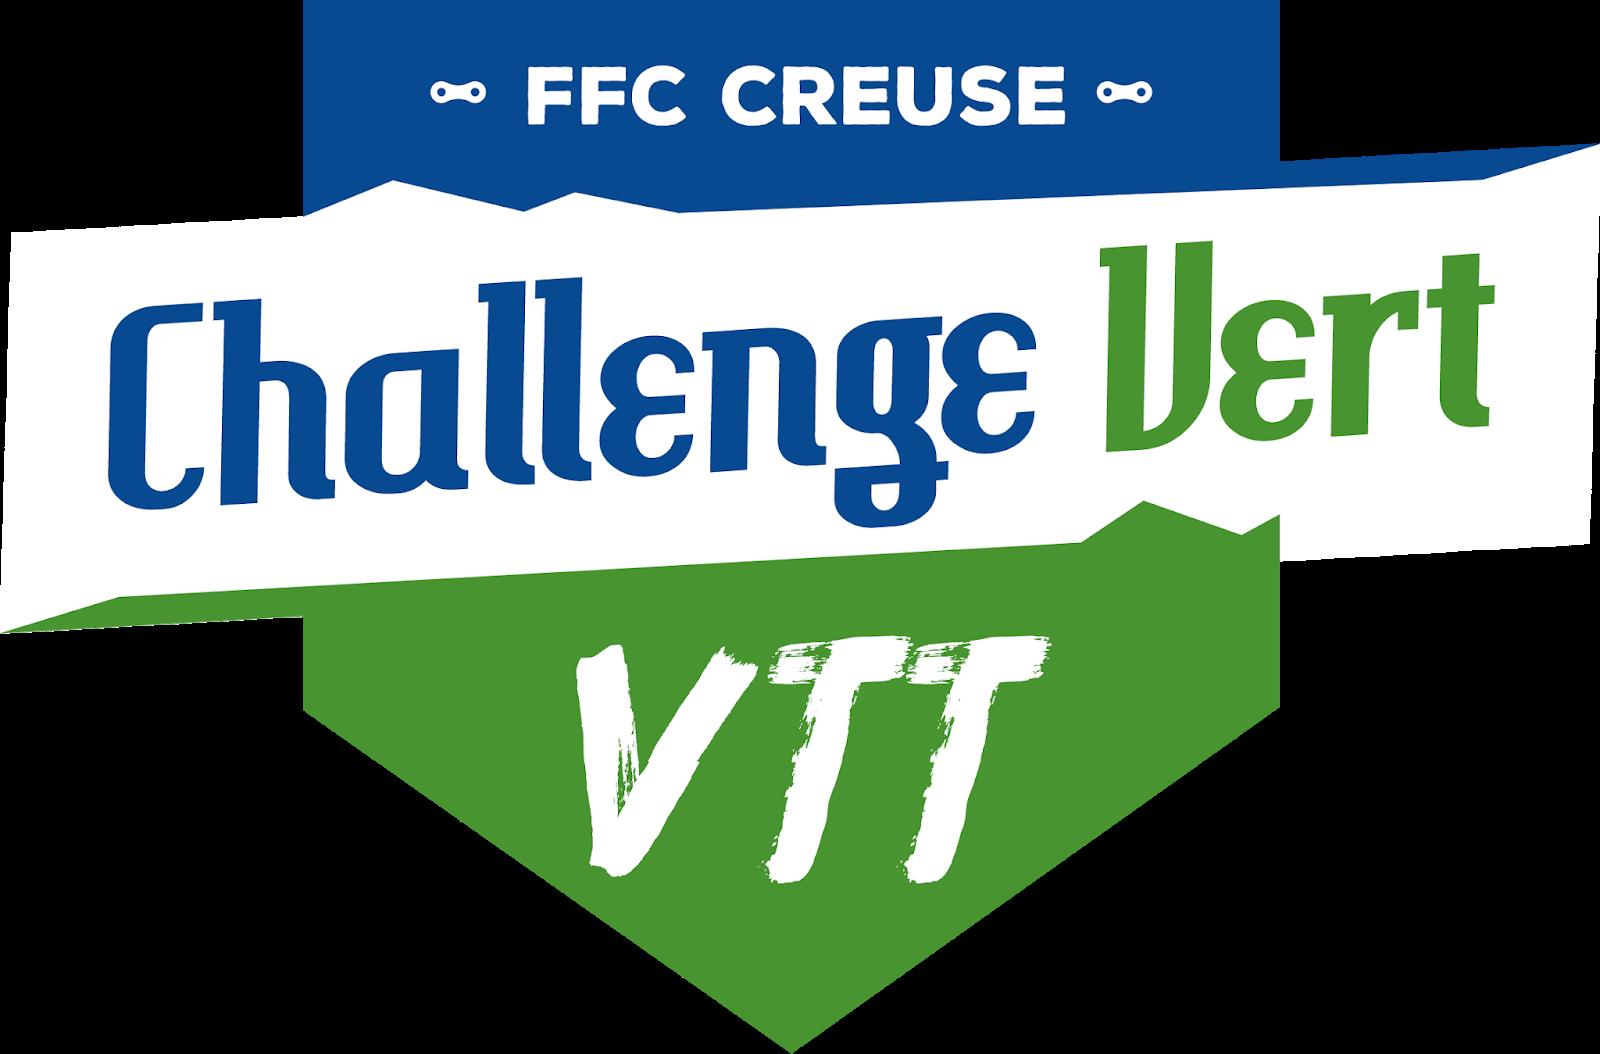 Calendrier Ffc Haut De France 2020.Comite Departemental Ffc De La Creuse 2019